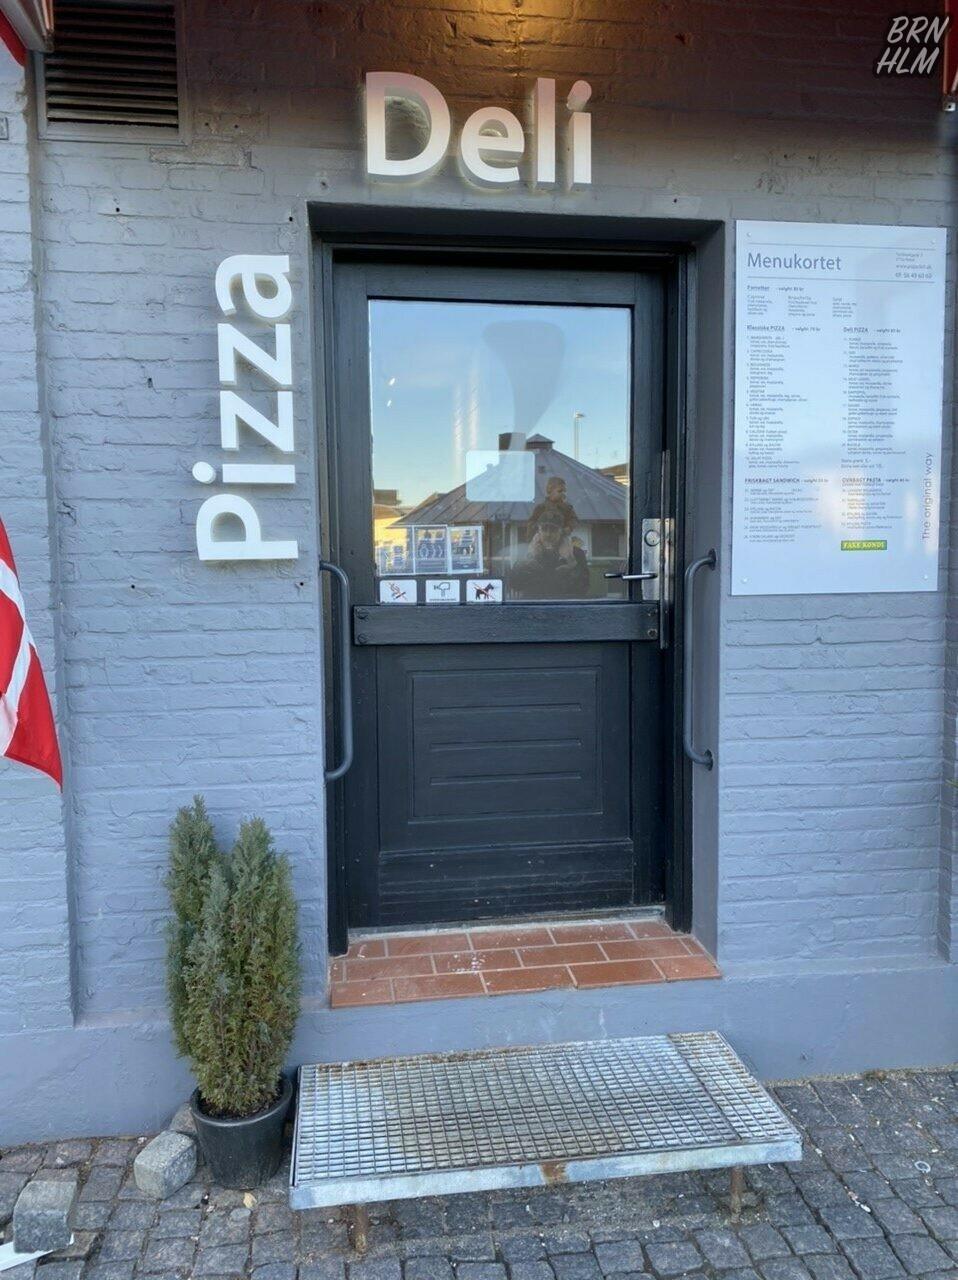 Pizza Deli i Nexø - 2021